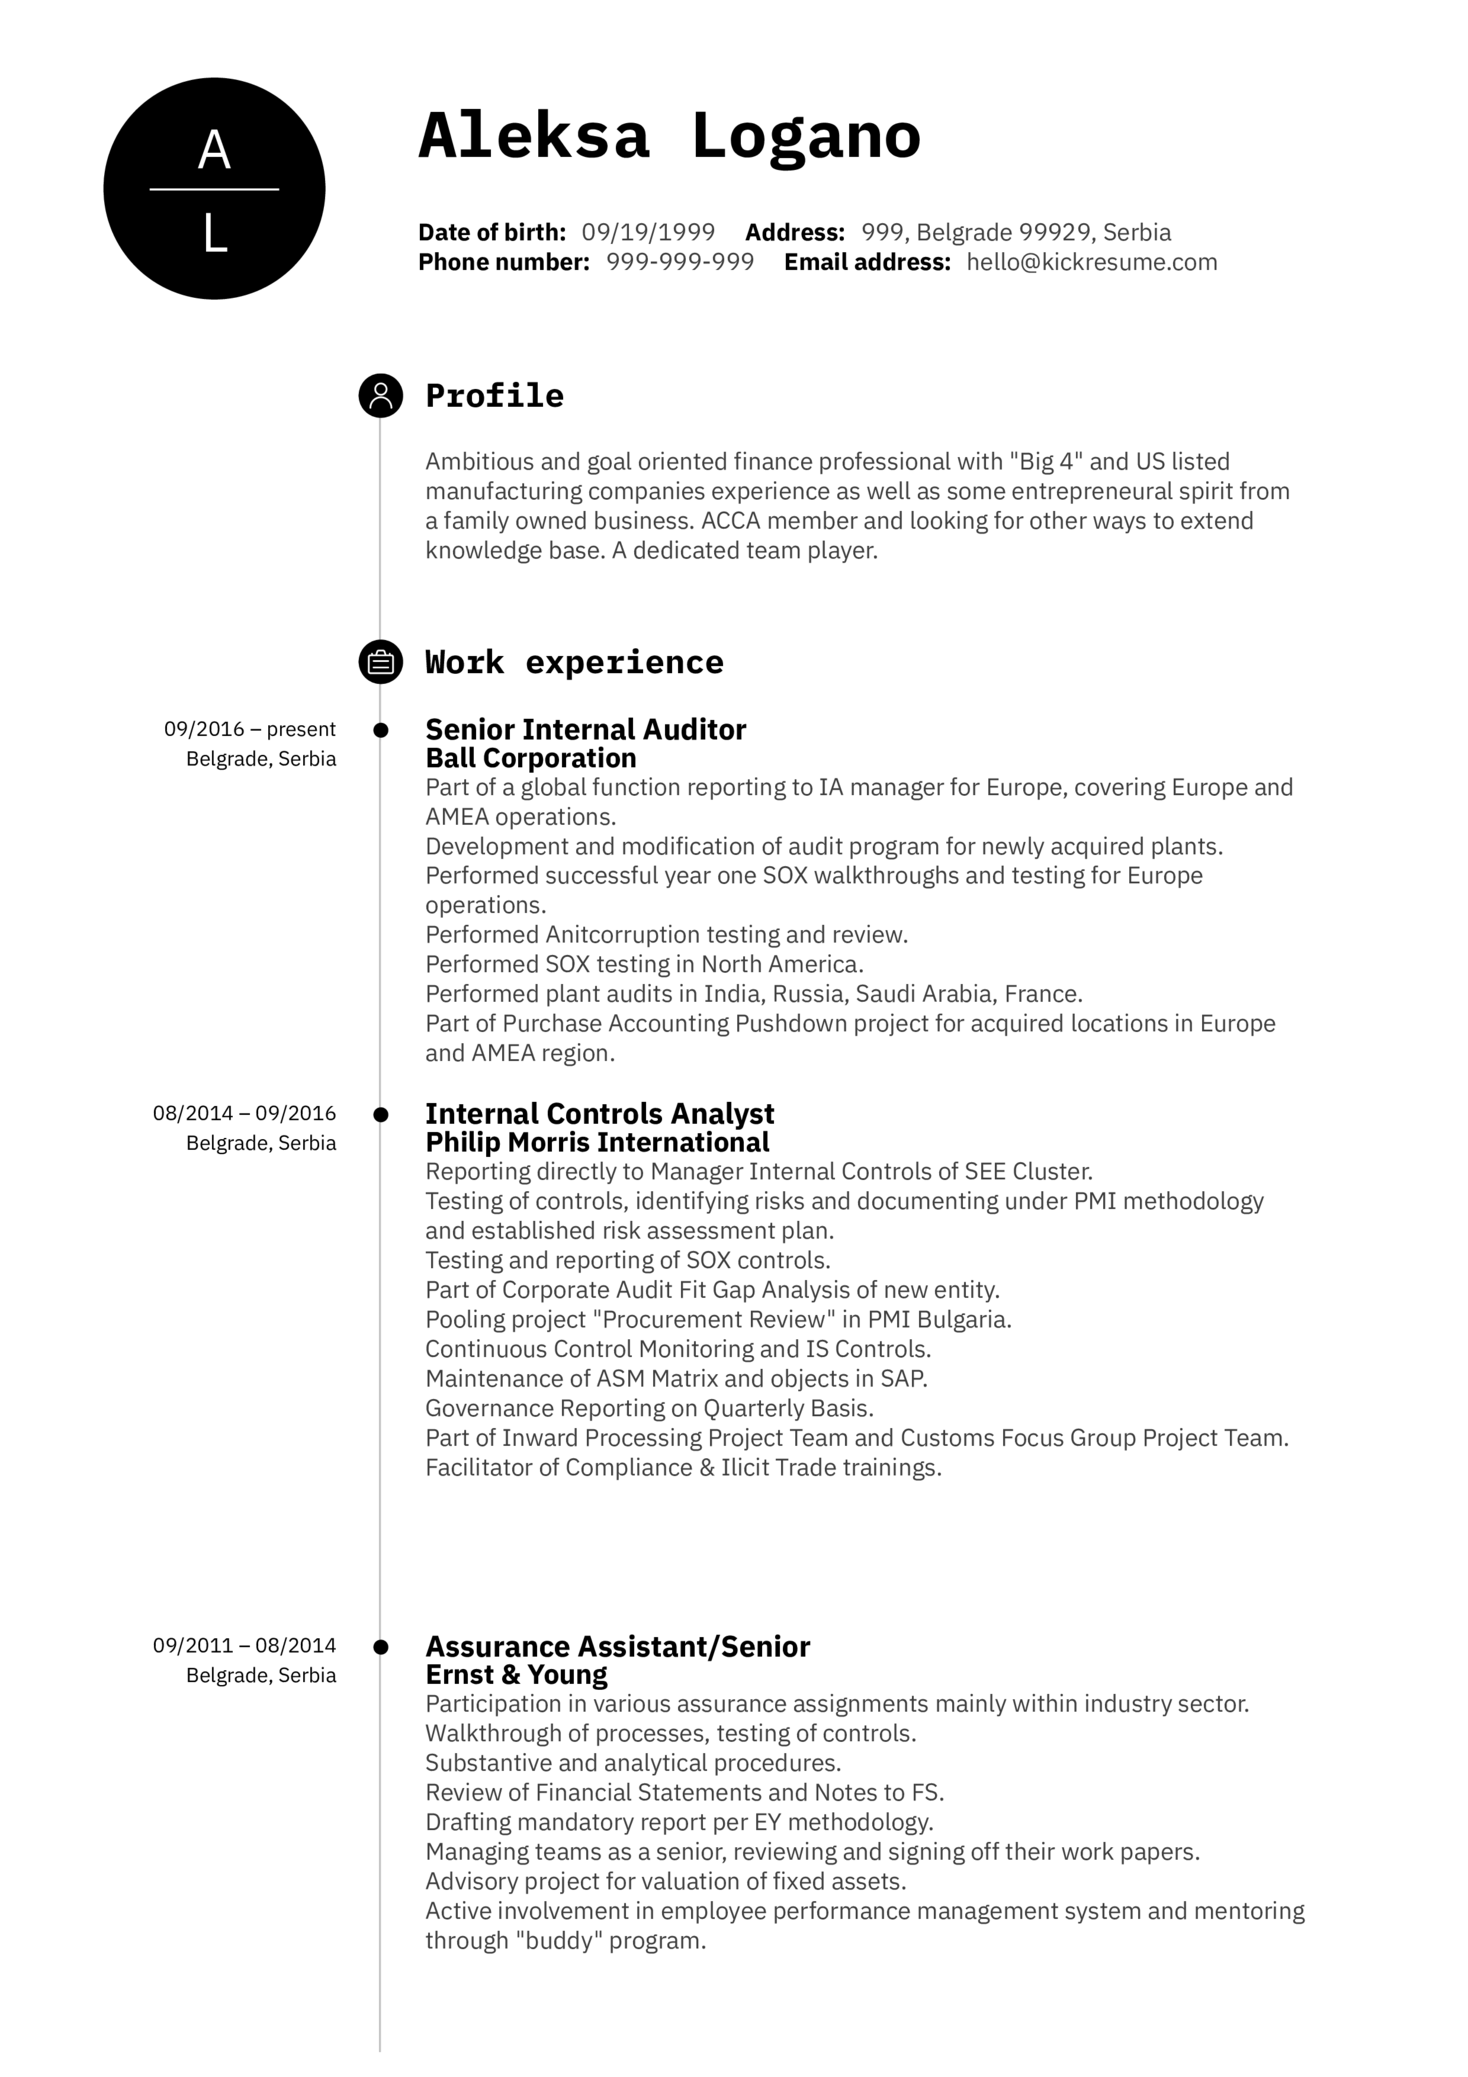 Senior Internal Auditor CV Sample (parte 1)